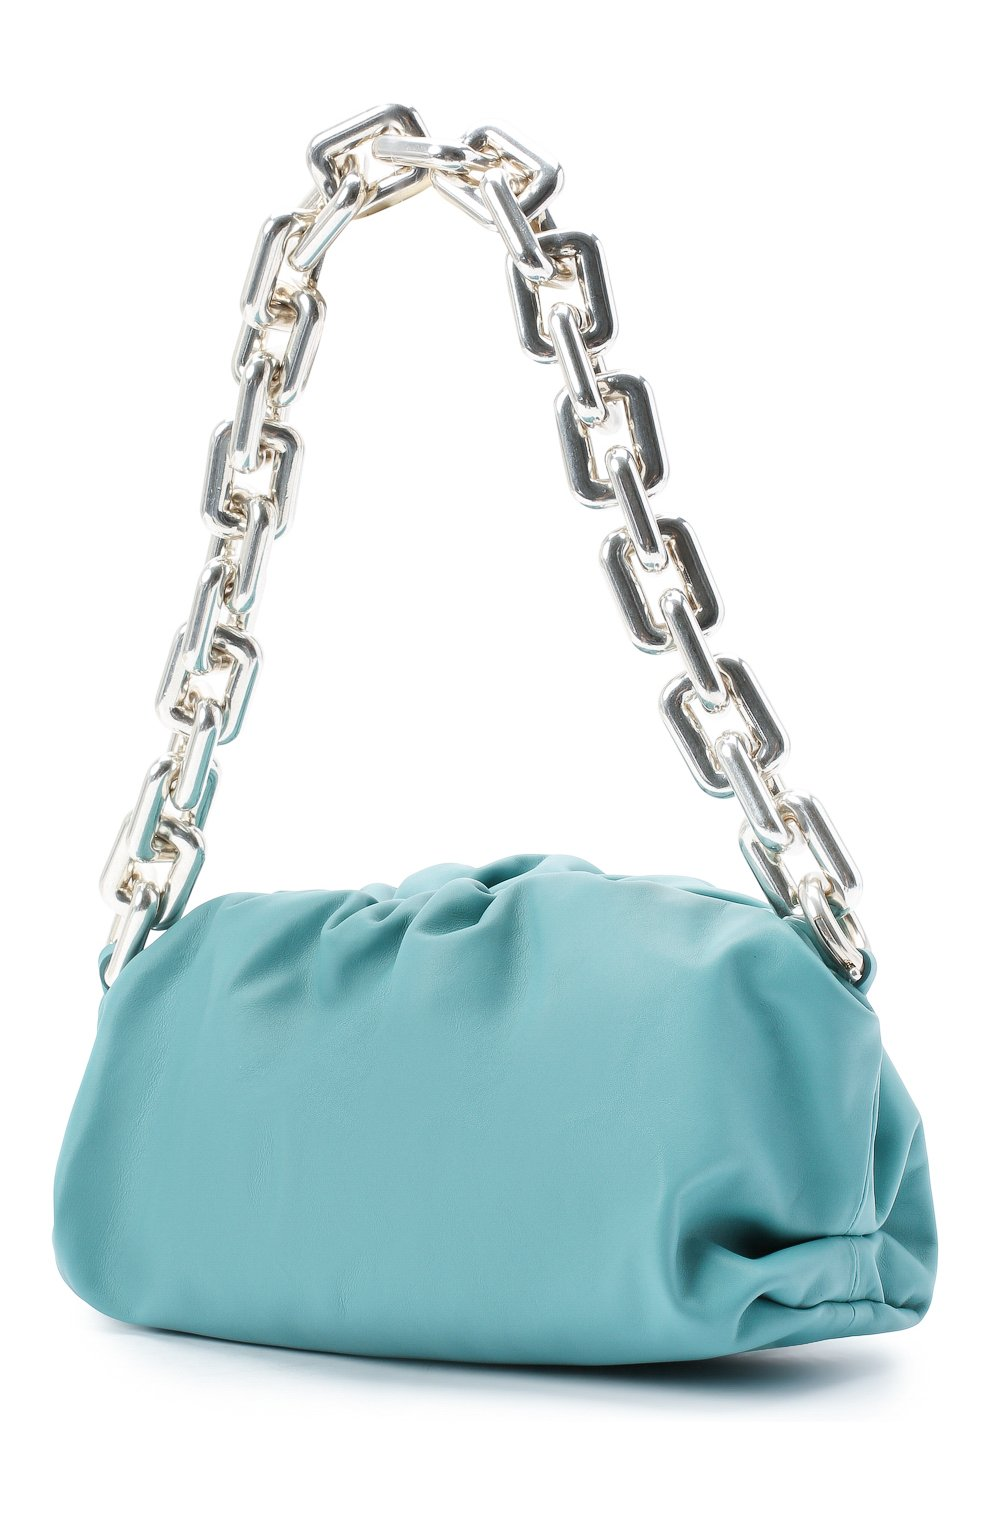 Женская сумка chain pouch BOTTEGA VENETA голубого цвета, арт. 620230/VCP40   Фото 3